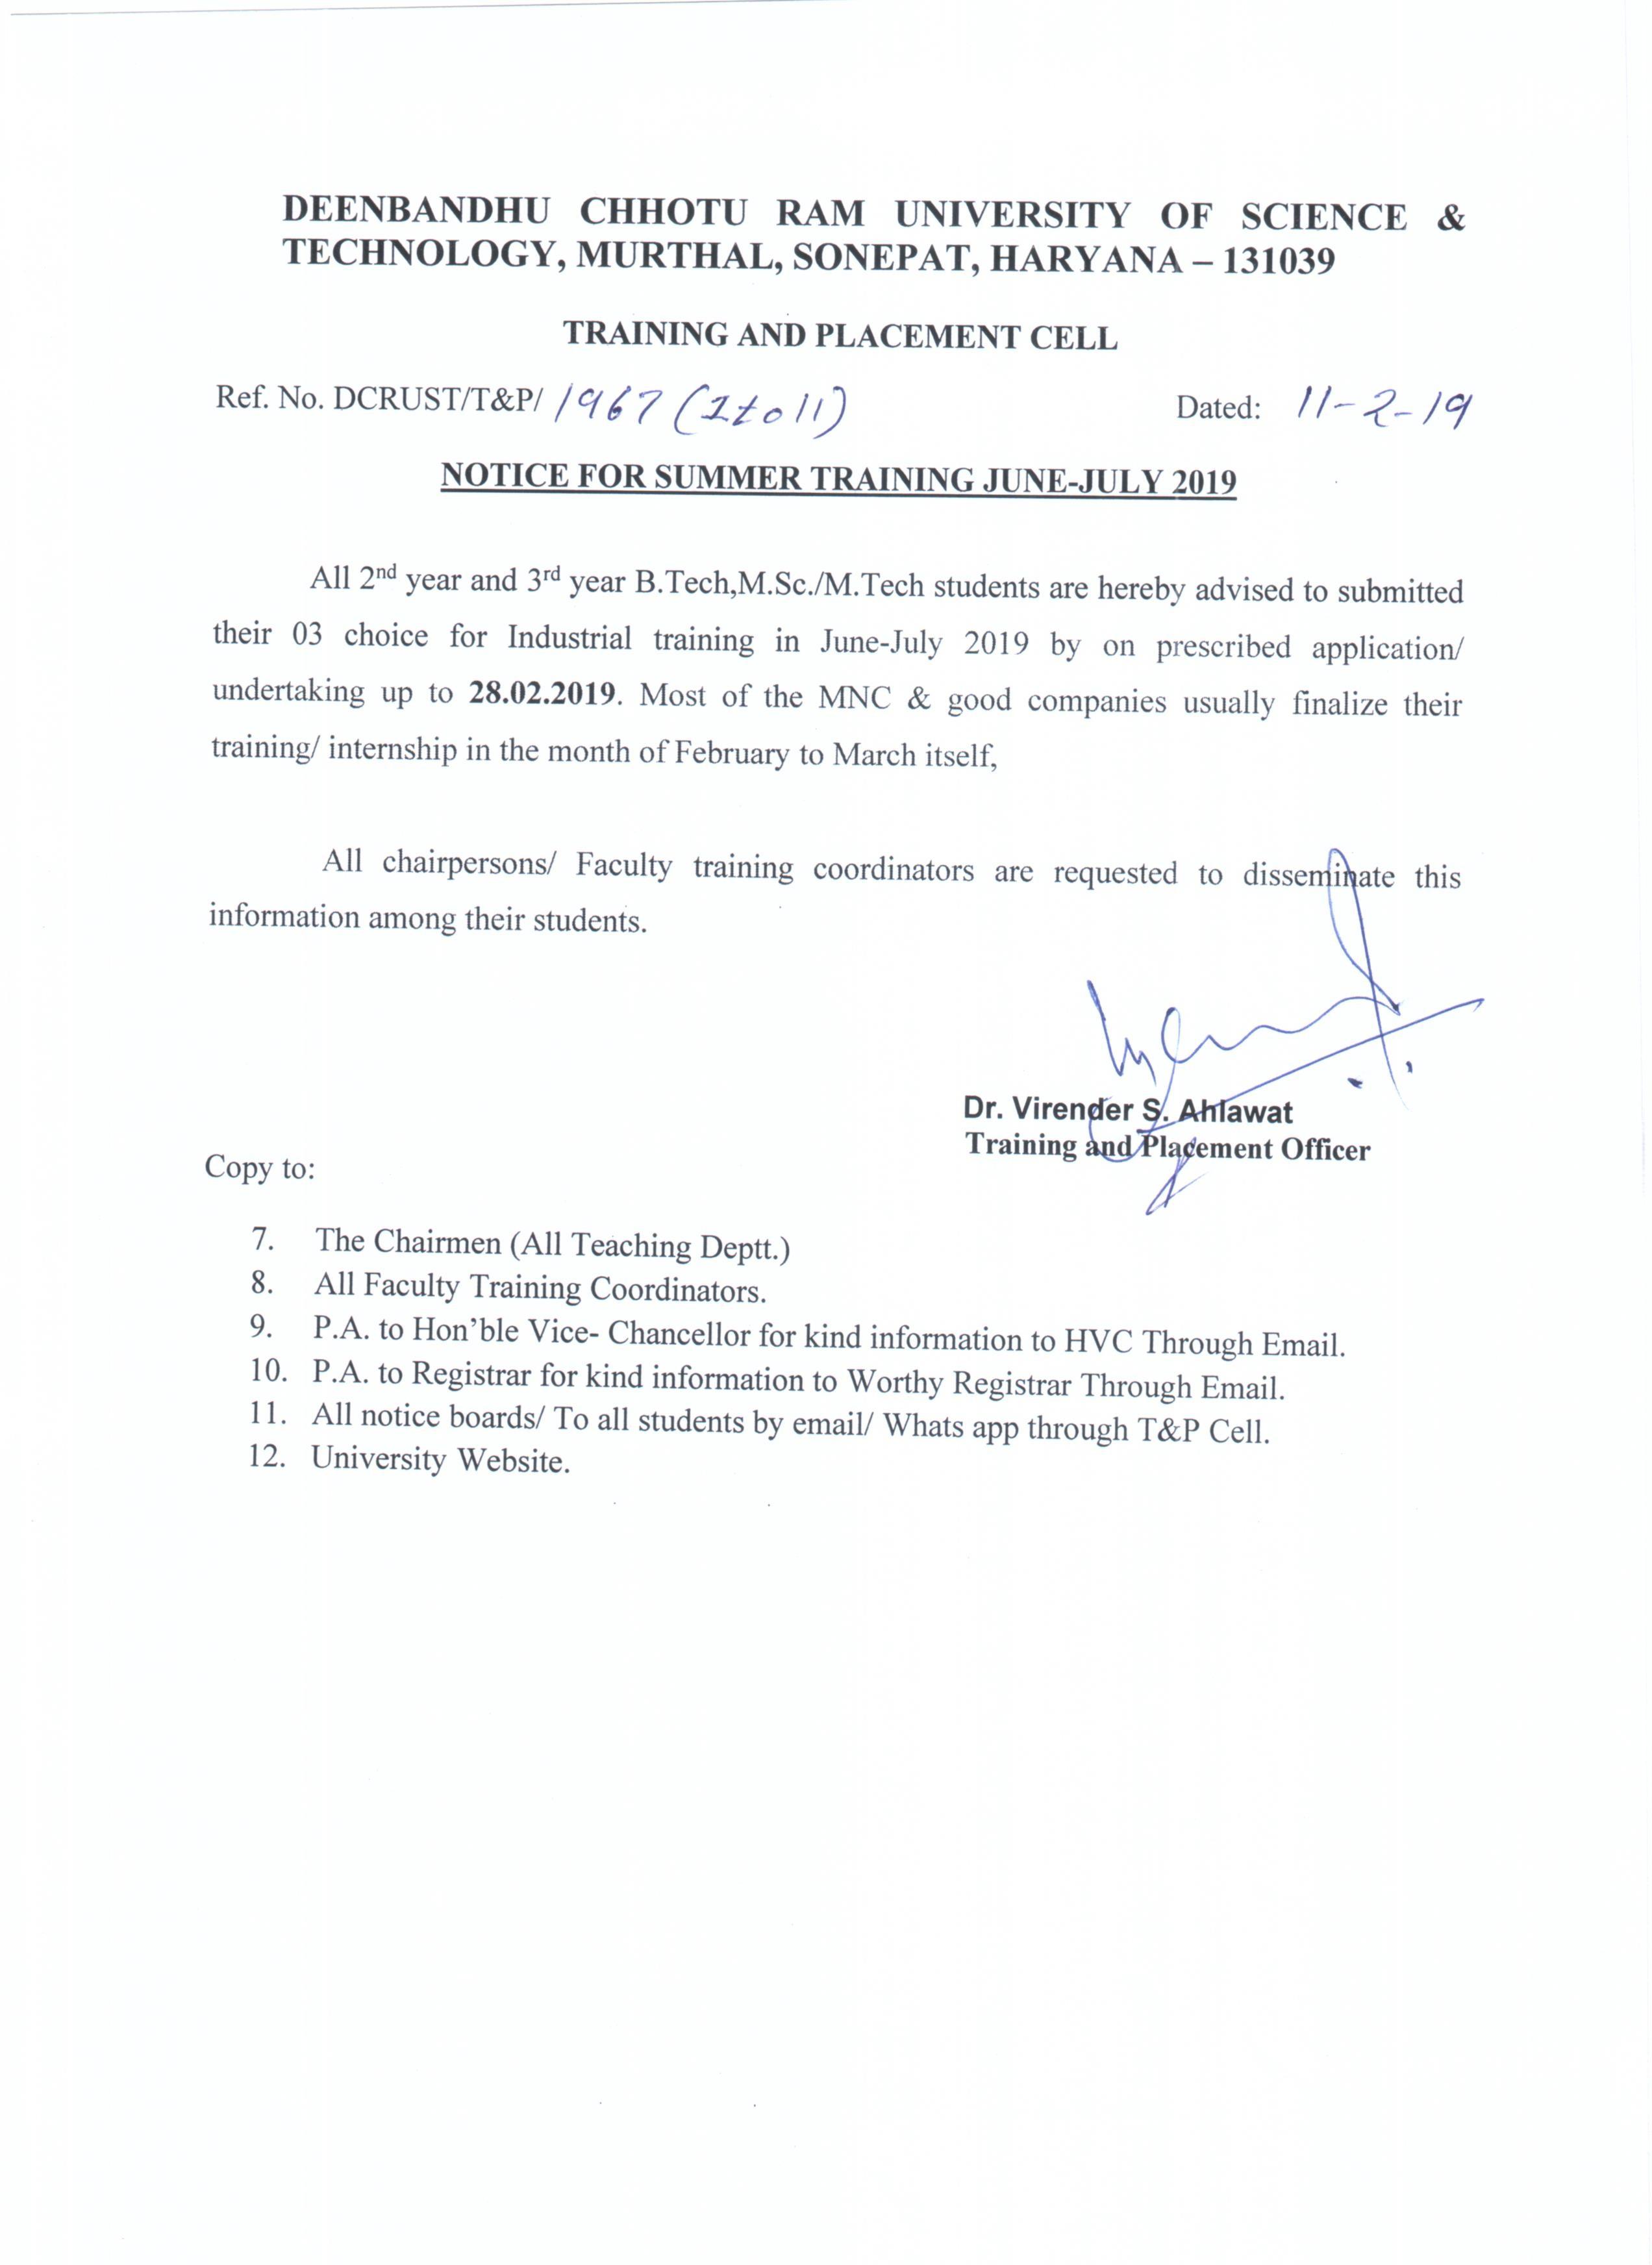 Notice for Summer Training June July 2019